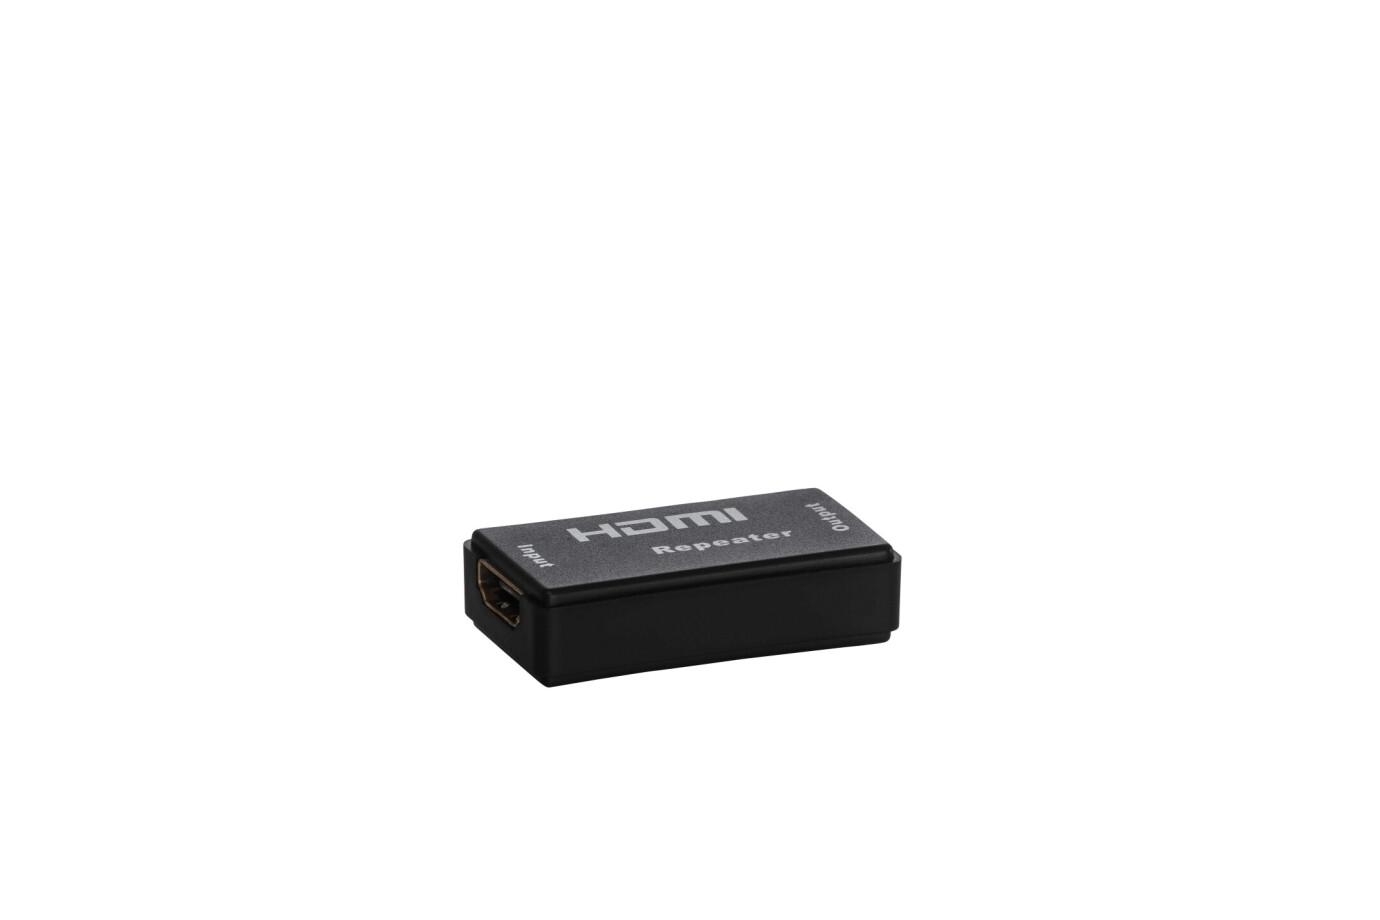 Celexon Expert HDMI Repeater